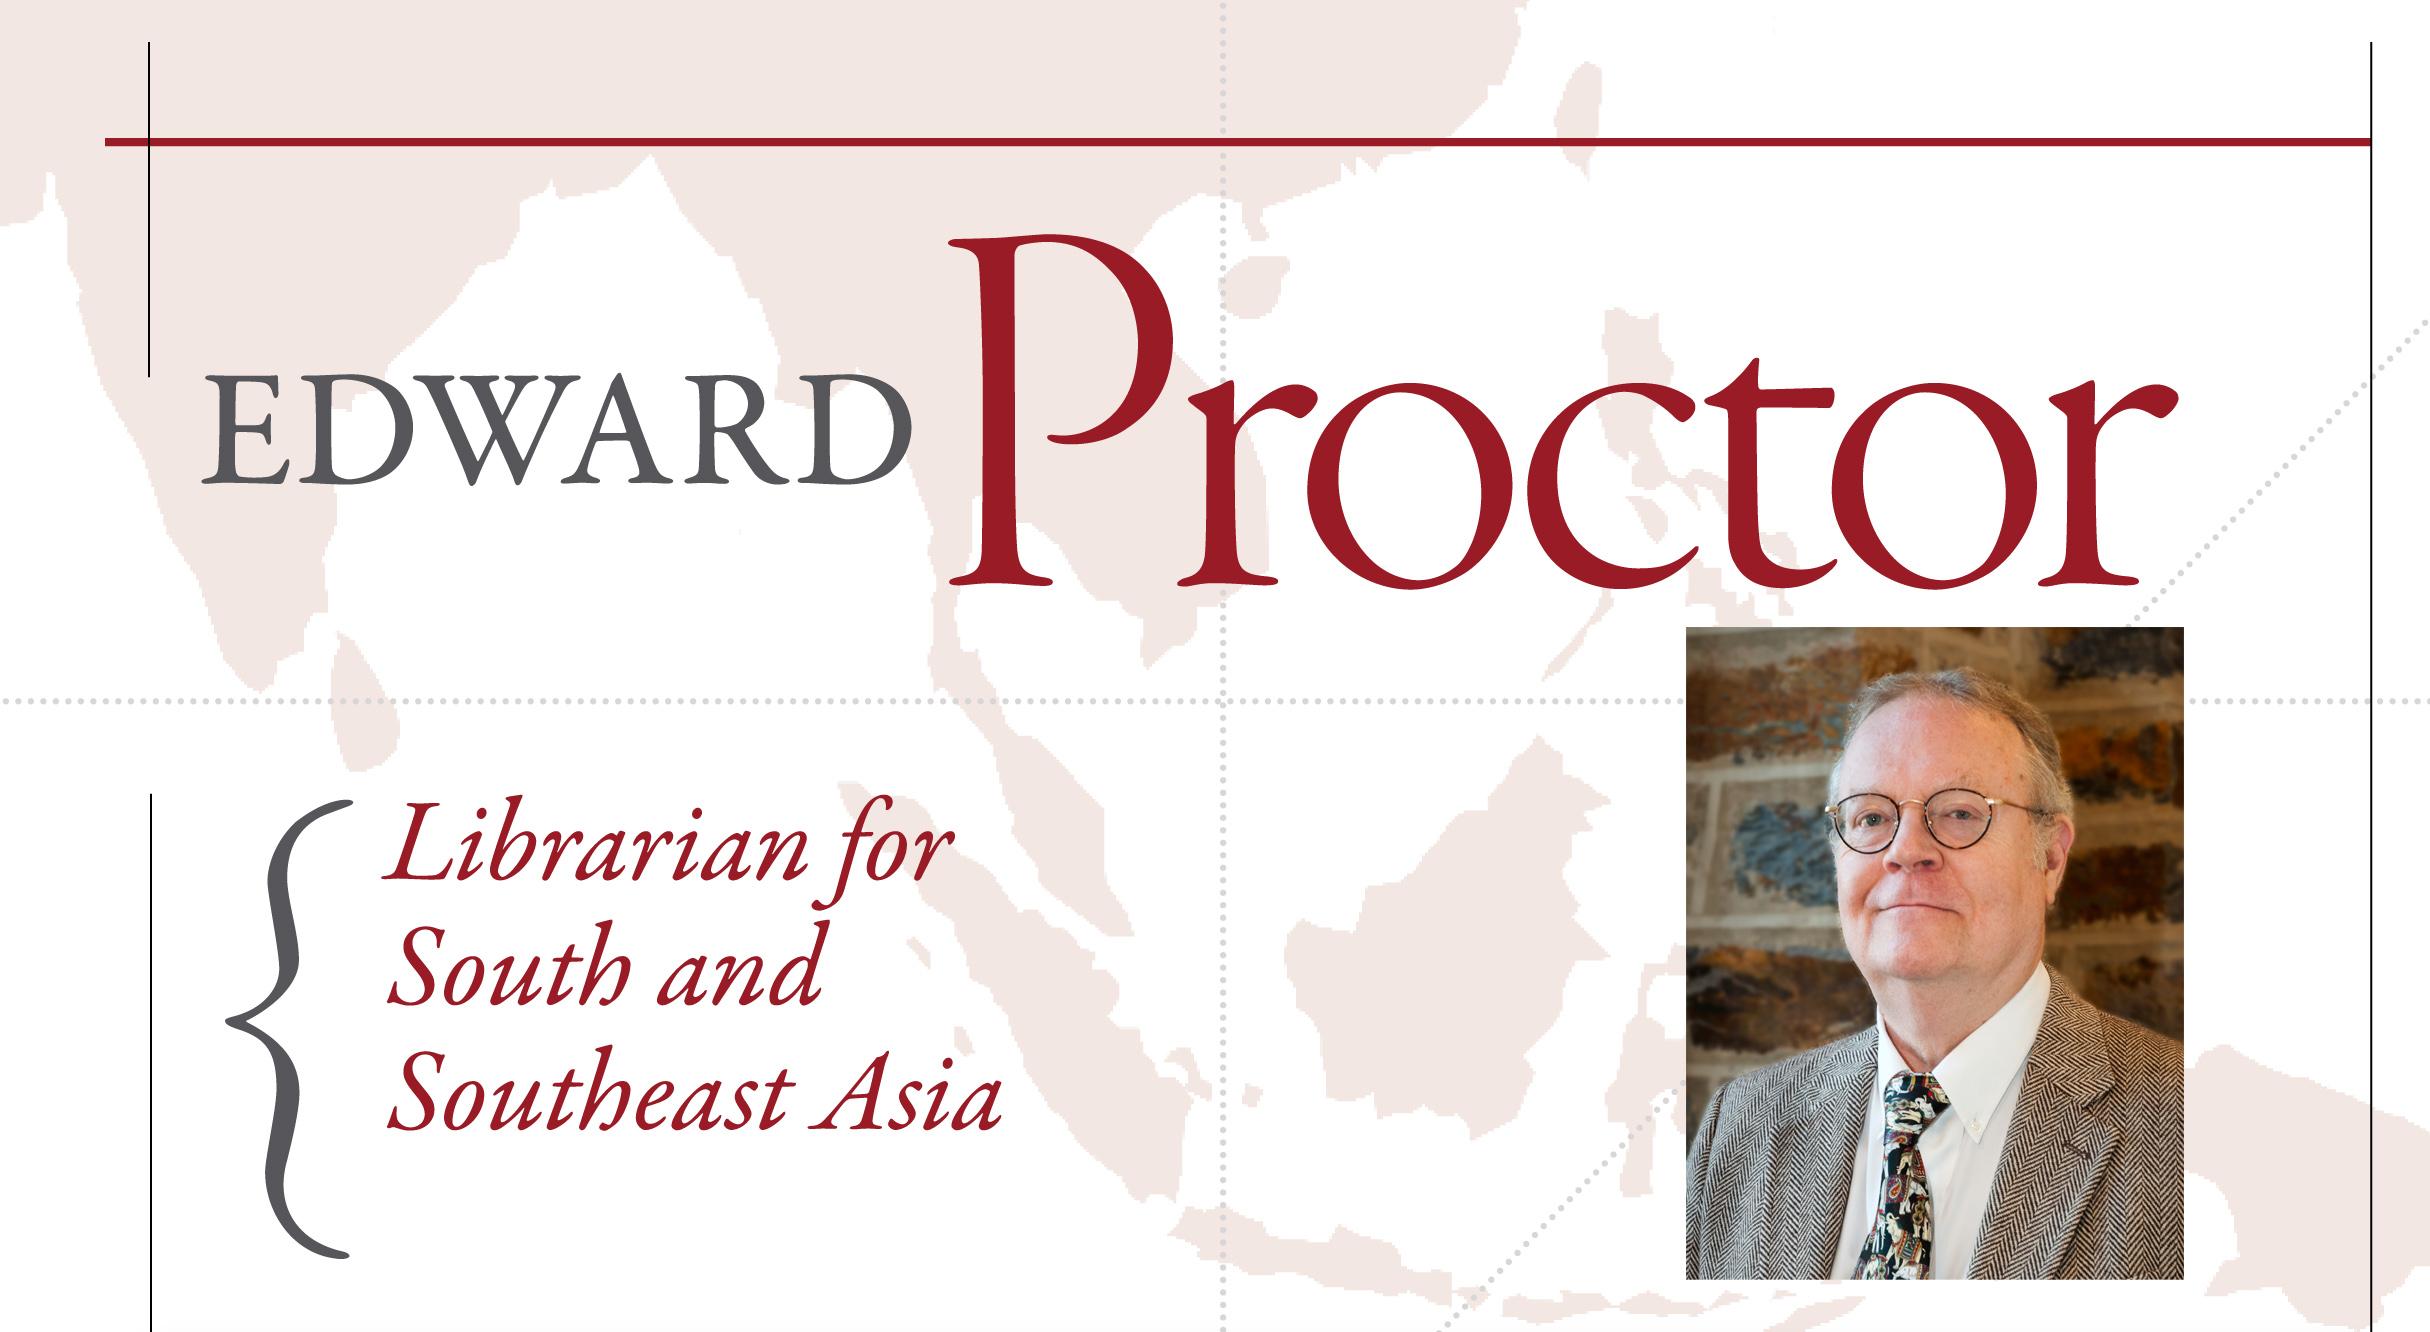 edward proctor